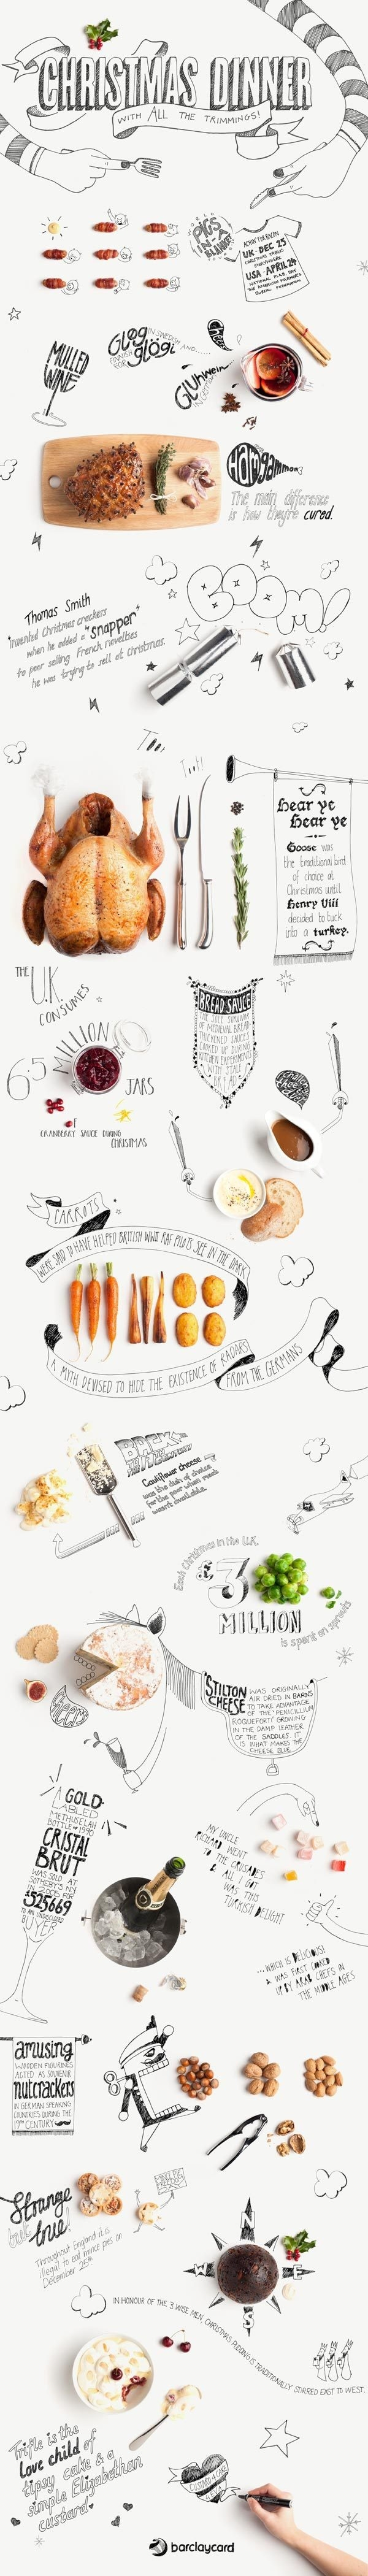 Gonzalo Azores X Barclaycard2 #dinner #illustration #art #xmas #eating